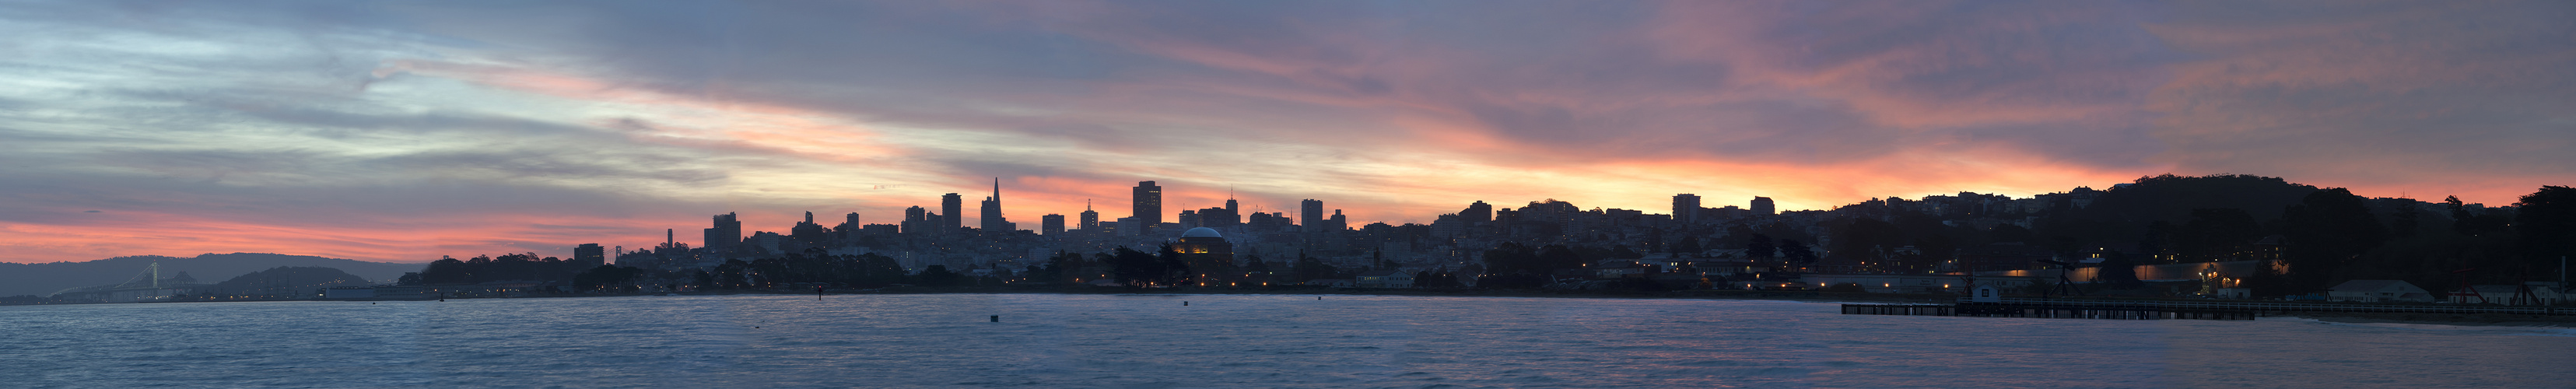 San Francisco Skyline bei Sonnenaufgang 02